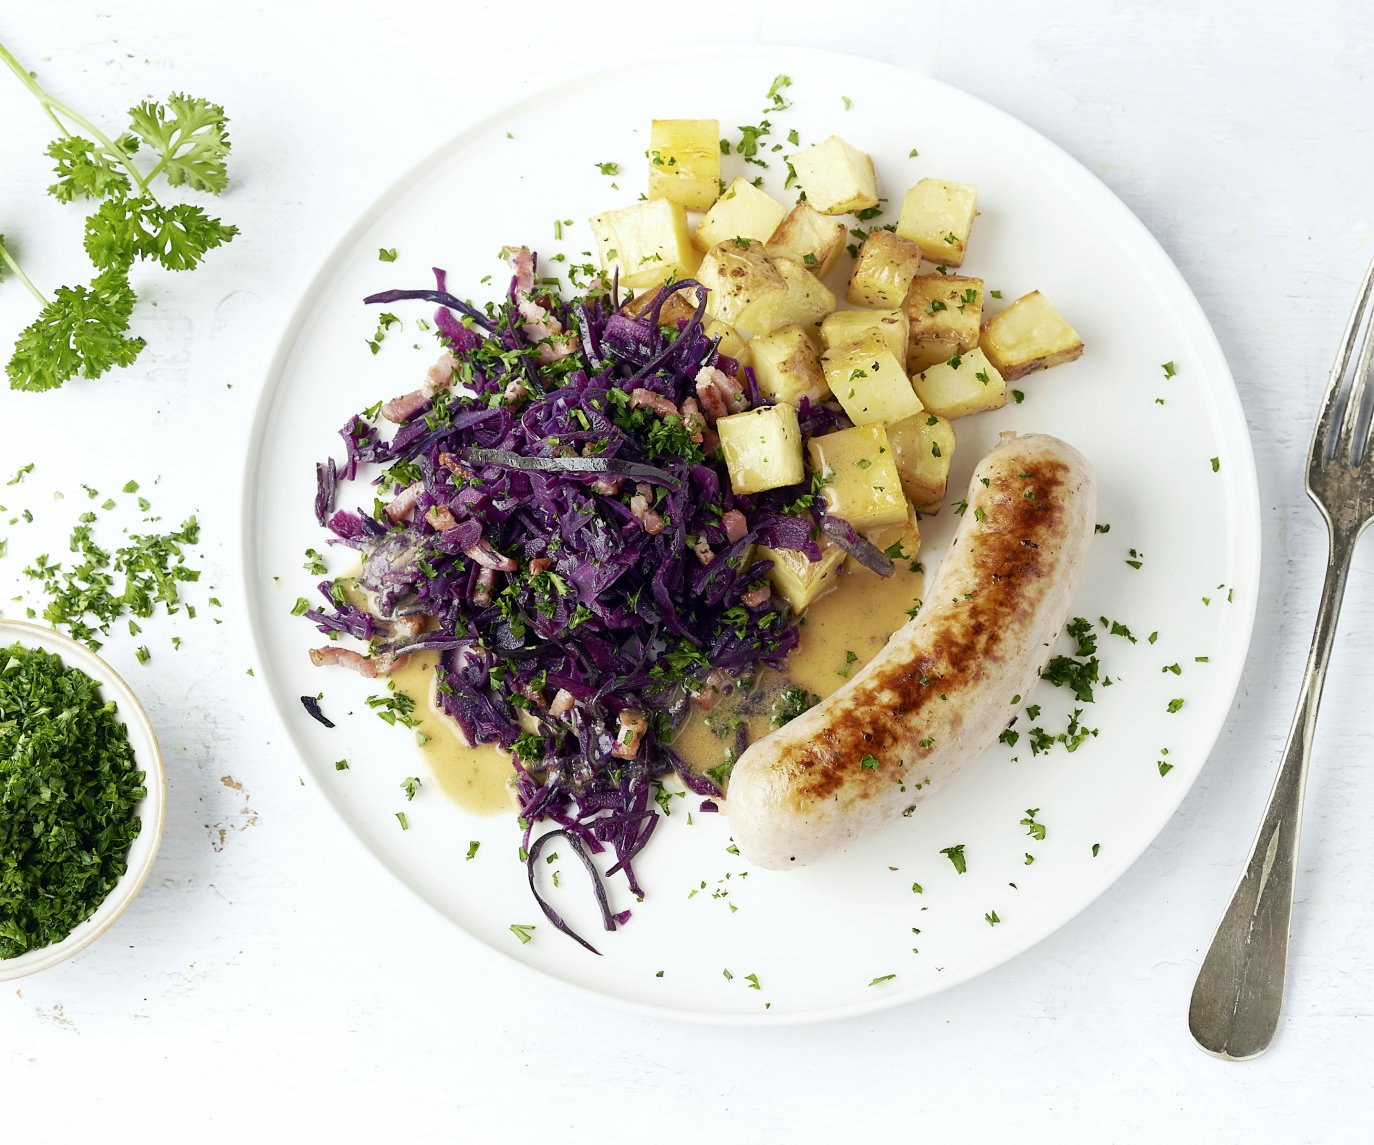 Witte pens met rodekool, spekjes en geroosterde aardappelen